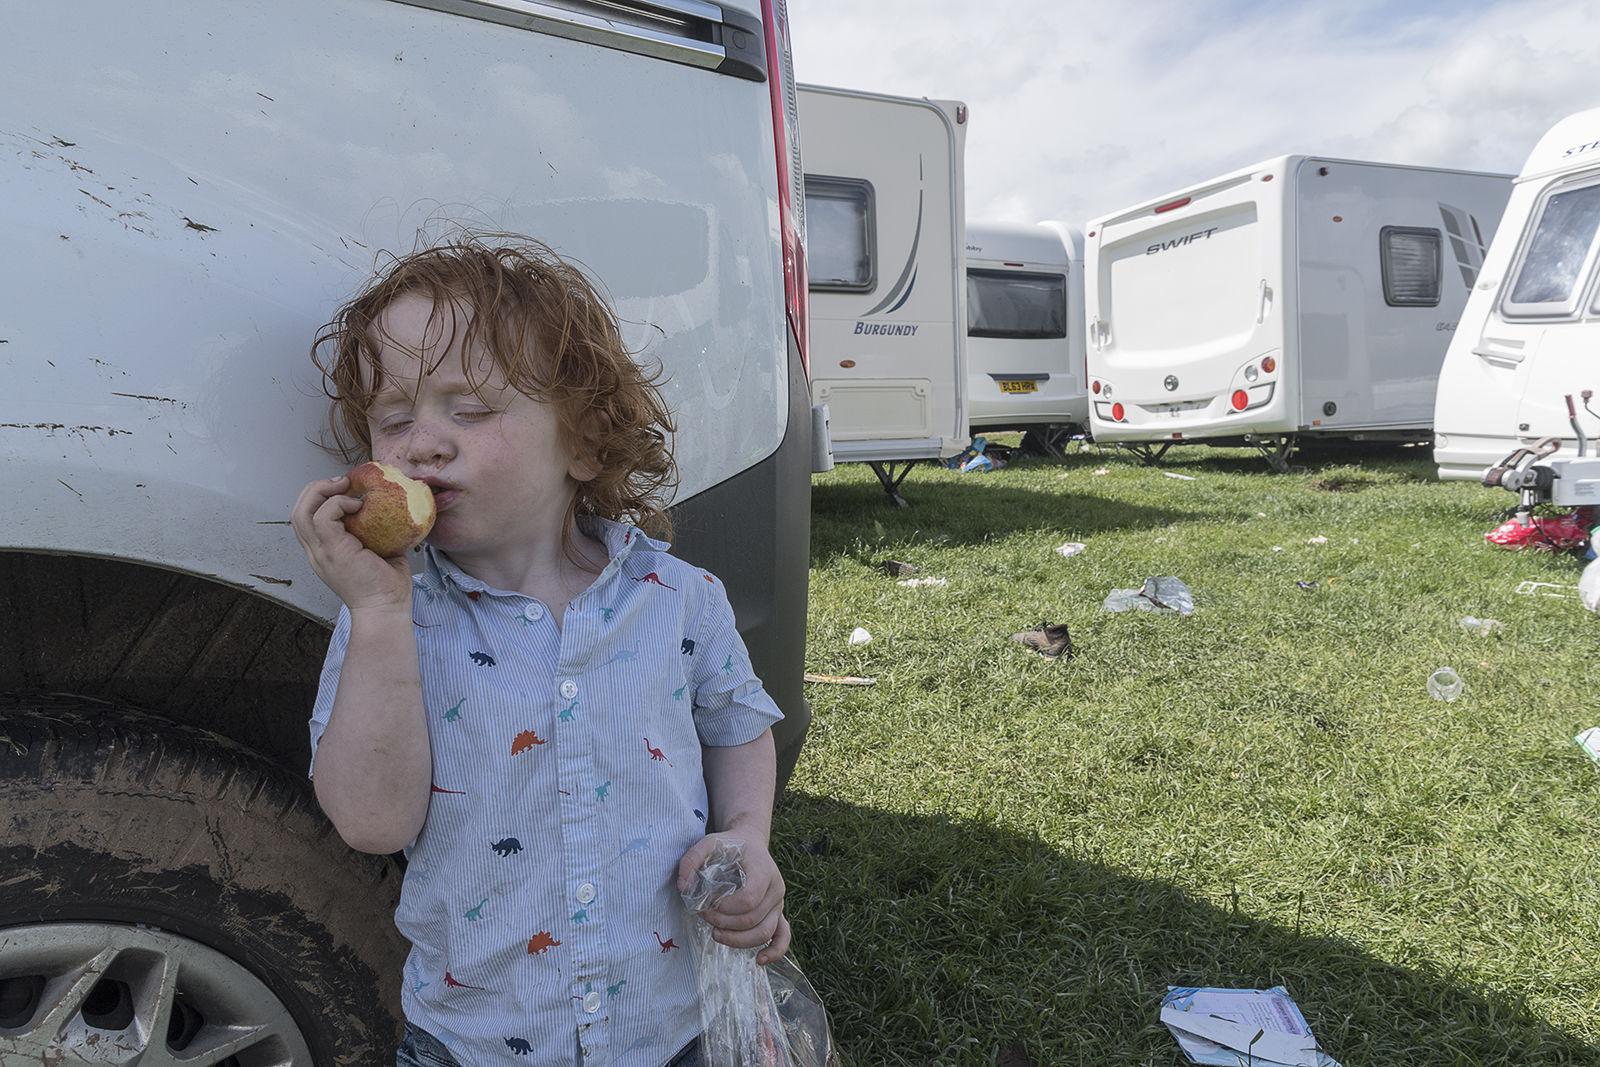 Josie, Appleby-in-Westmoreland, UK 2019